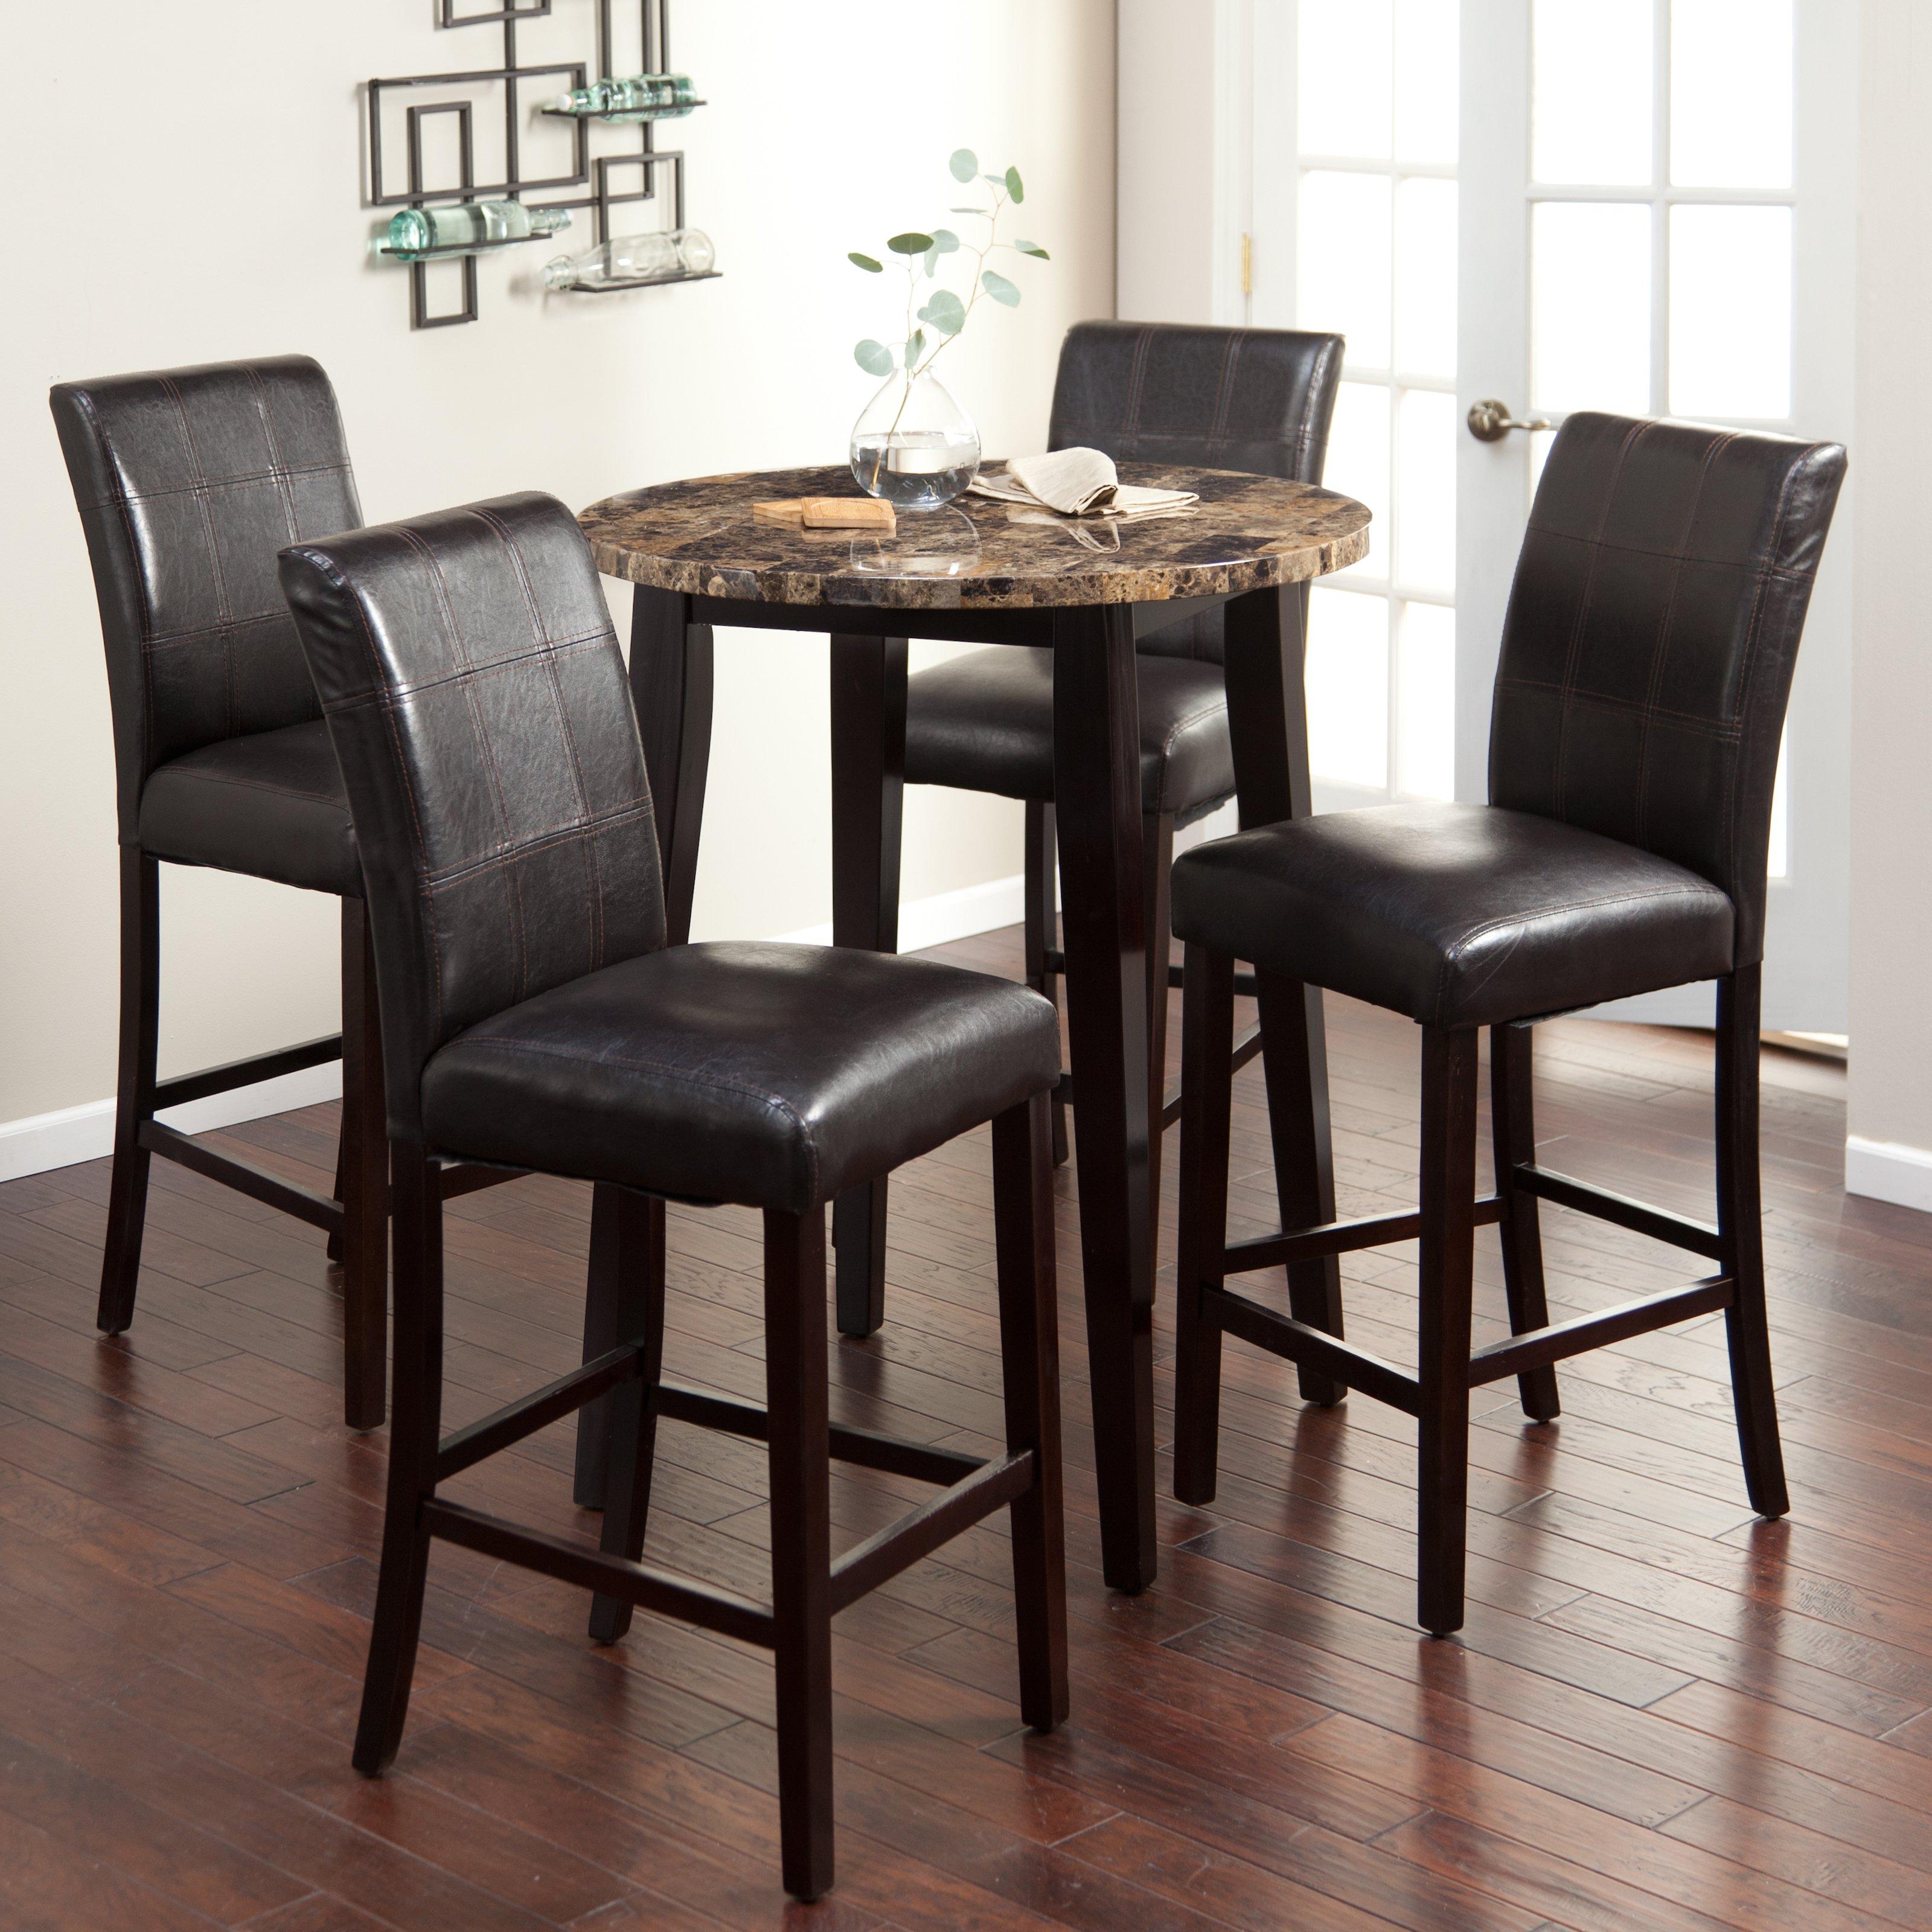 Cozy Palazzo 5 Piece Round Bar-Height Pub Set - Bar u0026 Pub Tables bar height pub table sets